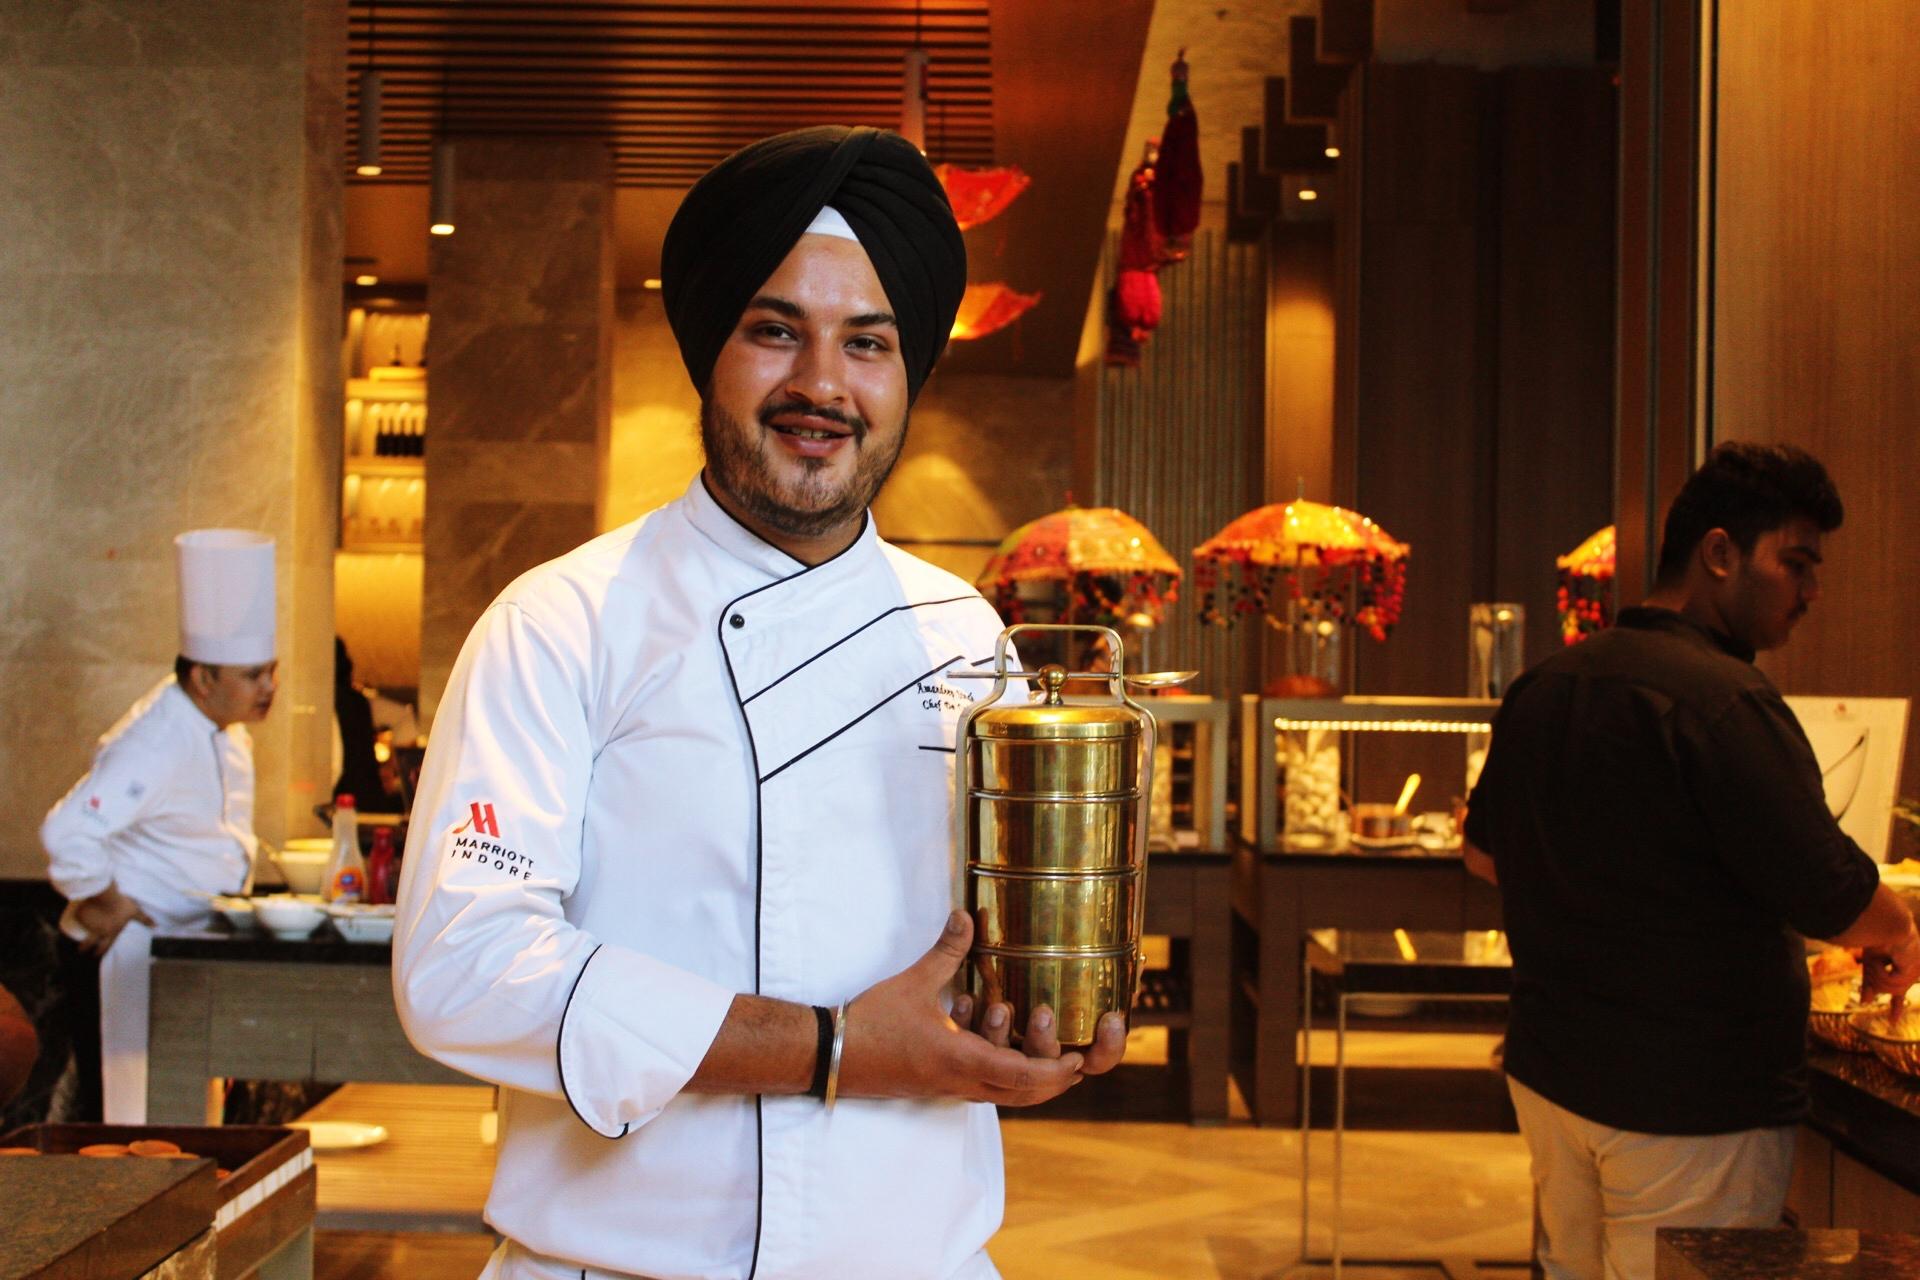 Chef Amandeep Singh